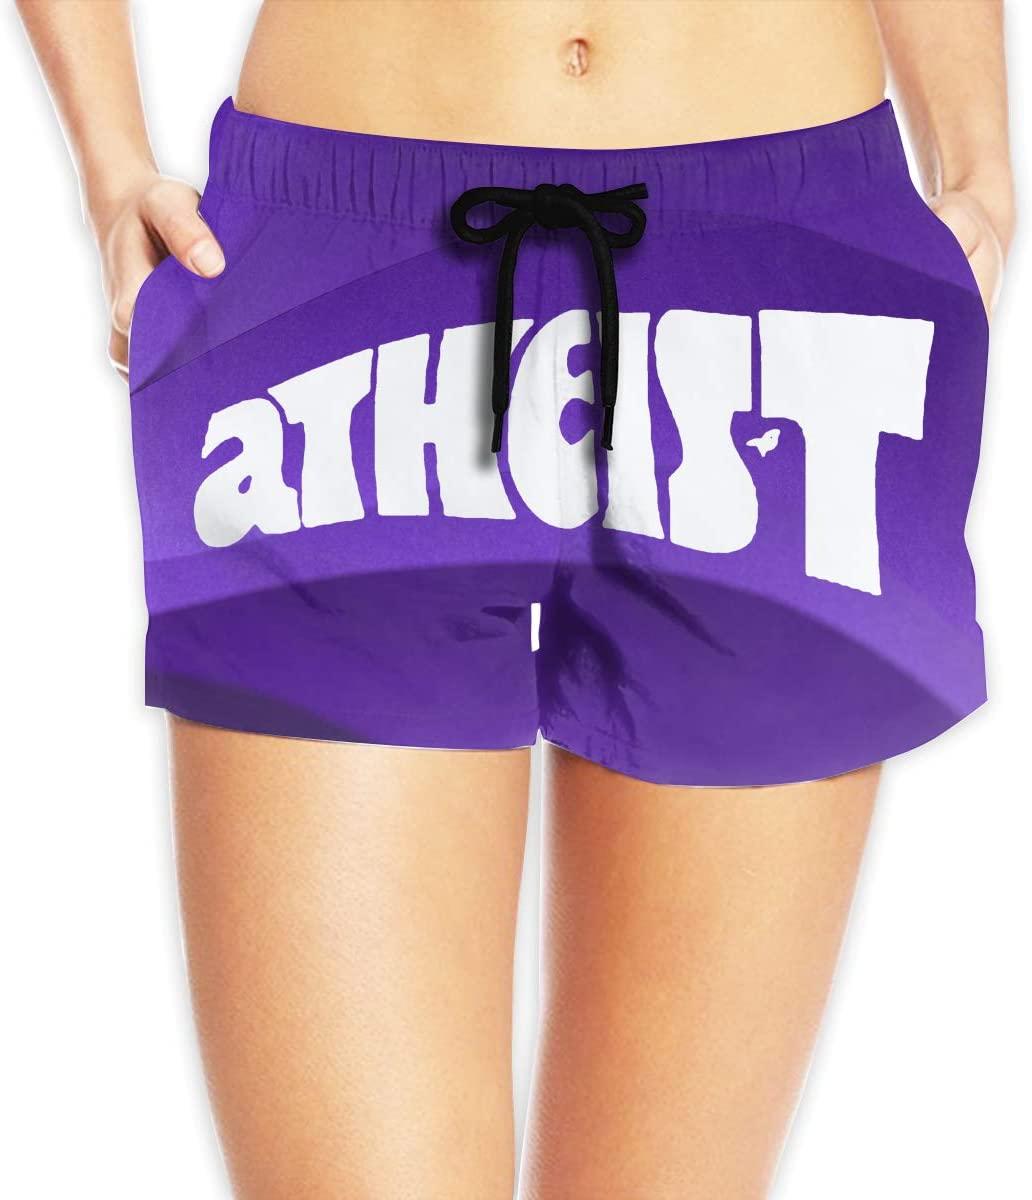 Hdecrr FFRE W Atheist Womens Shorts Summer Quick Dry Drawstring Elastic Waist Casual Beach Shorts